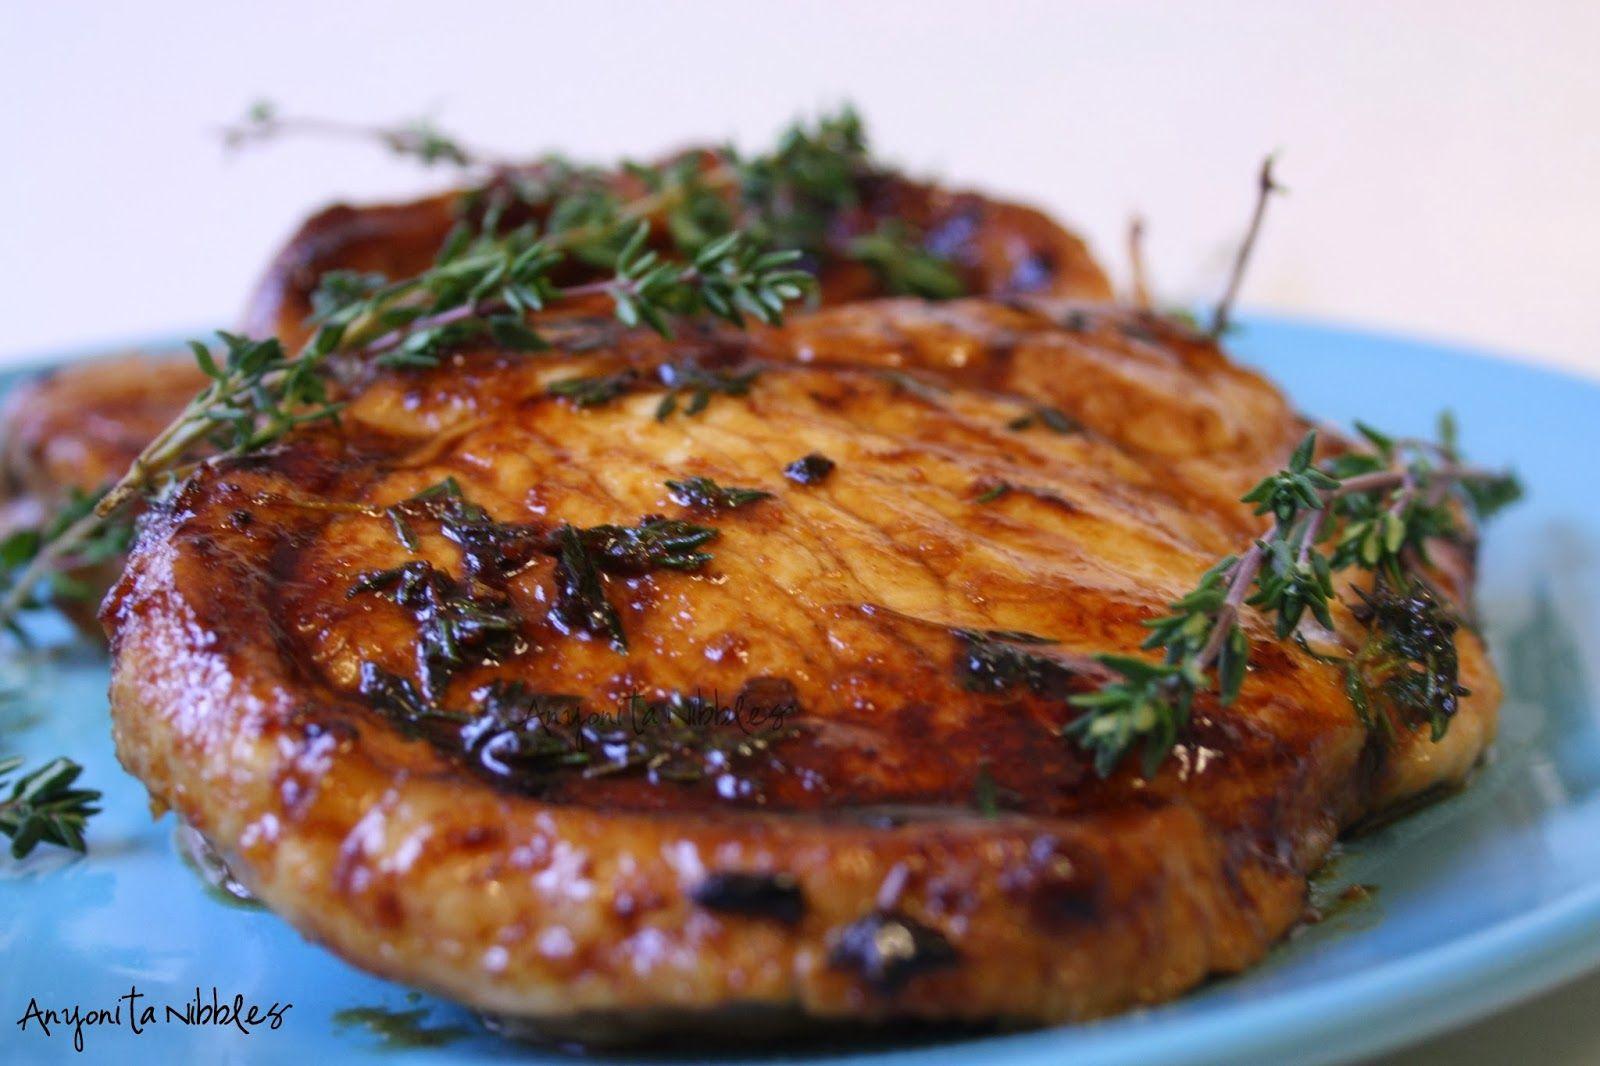 Pork chops made with honey, fresh thyme, orange juice and mustard